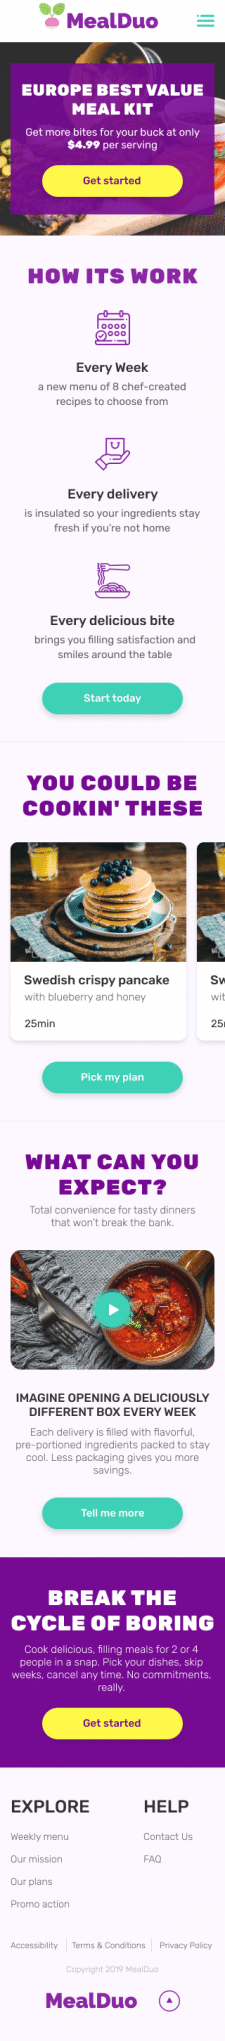 MealDuo Mobile